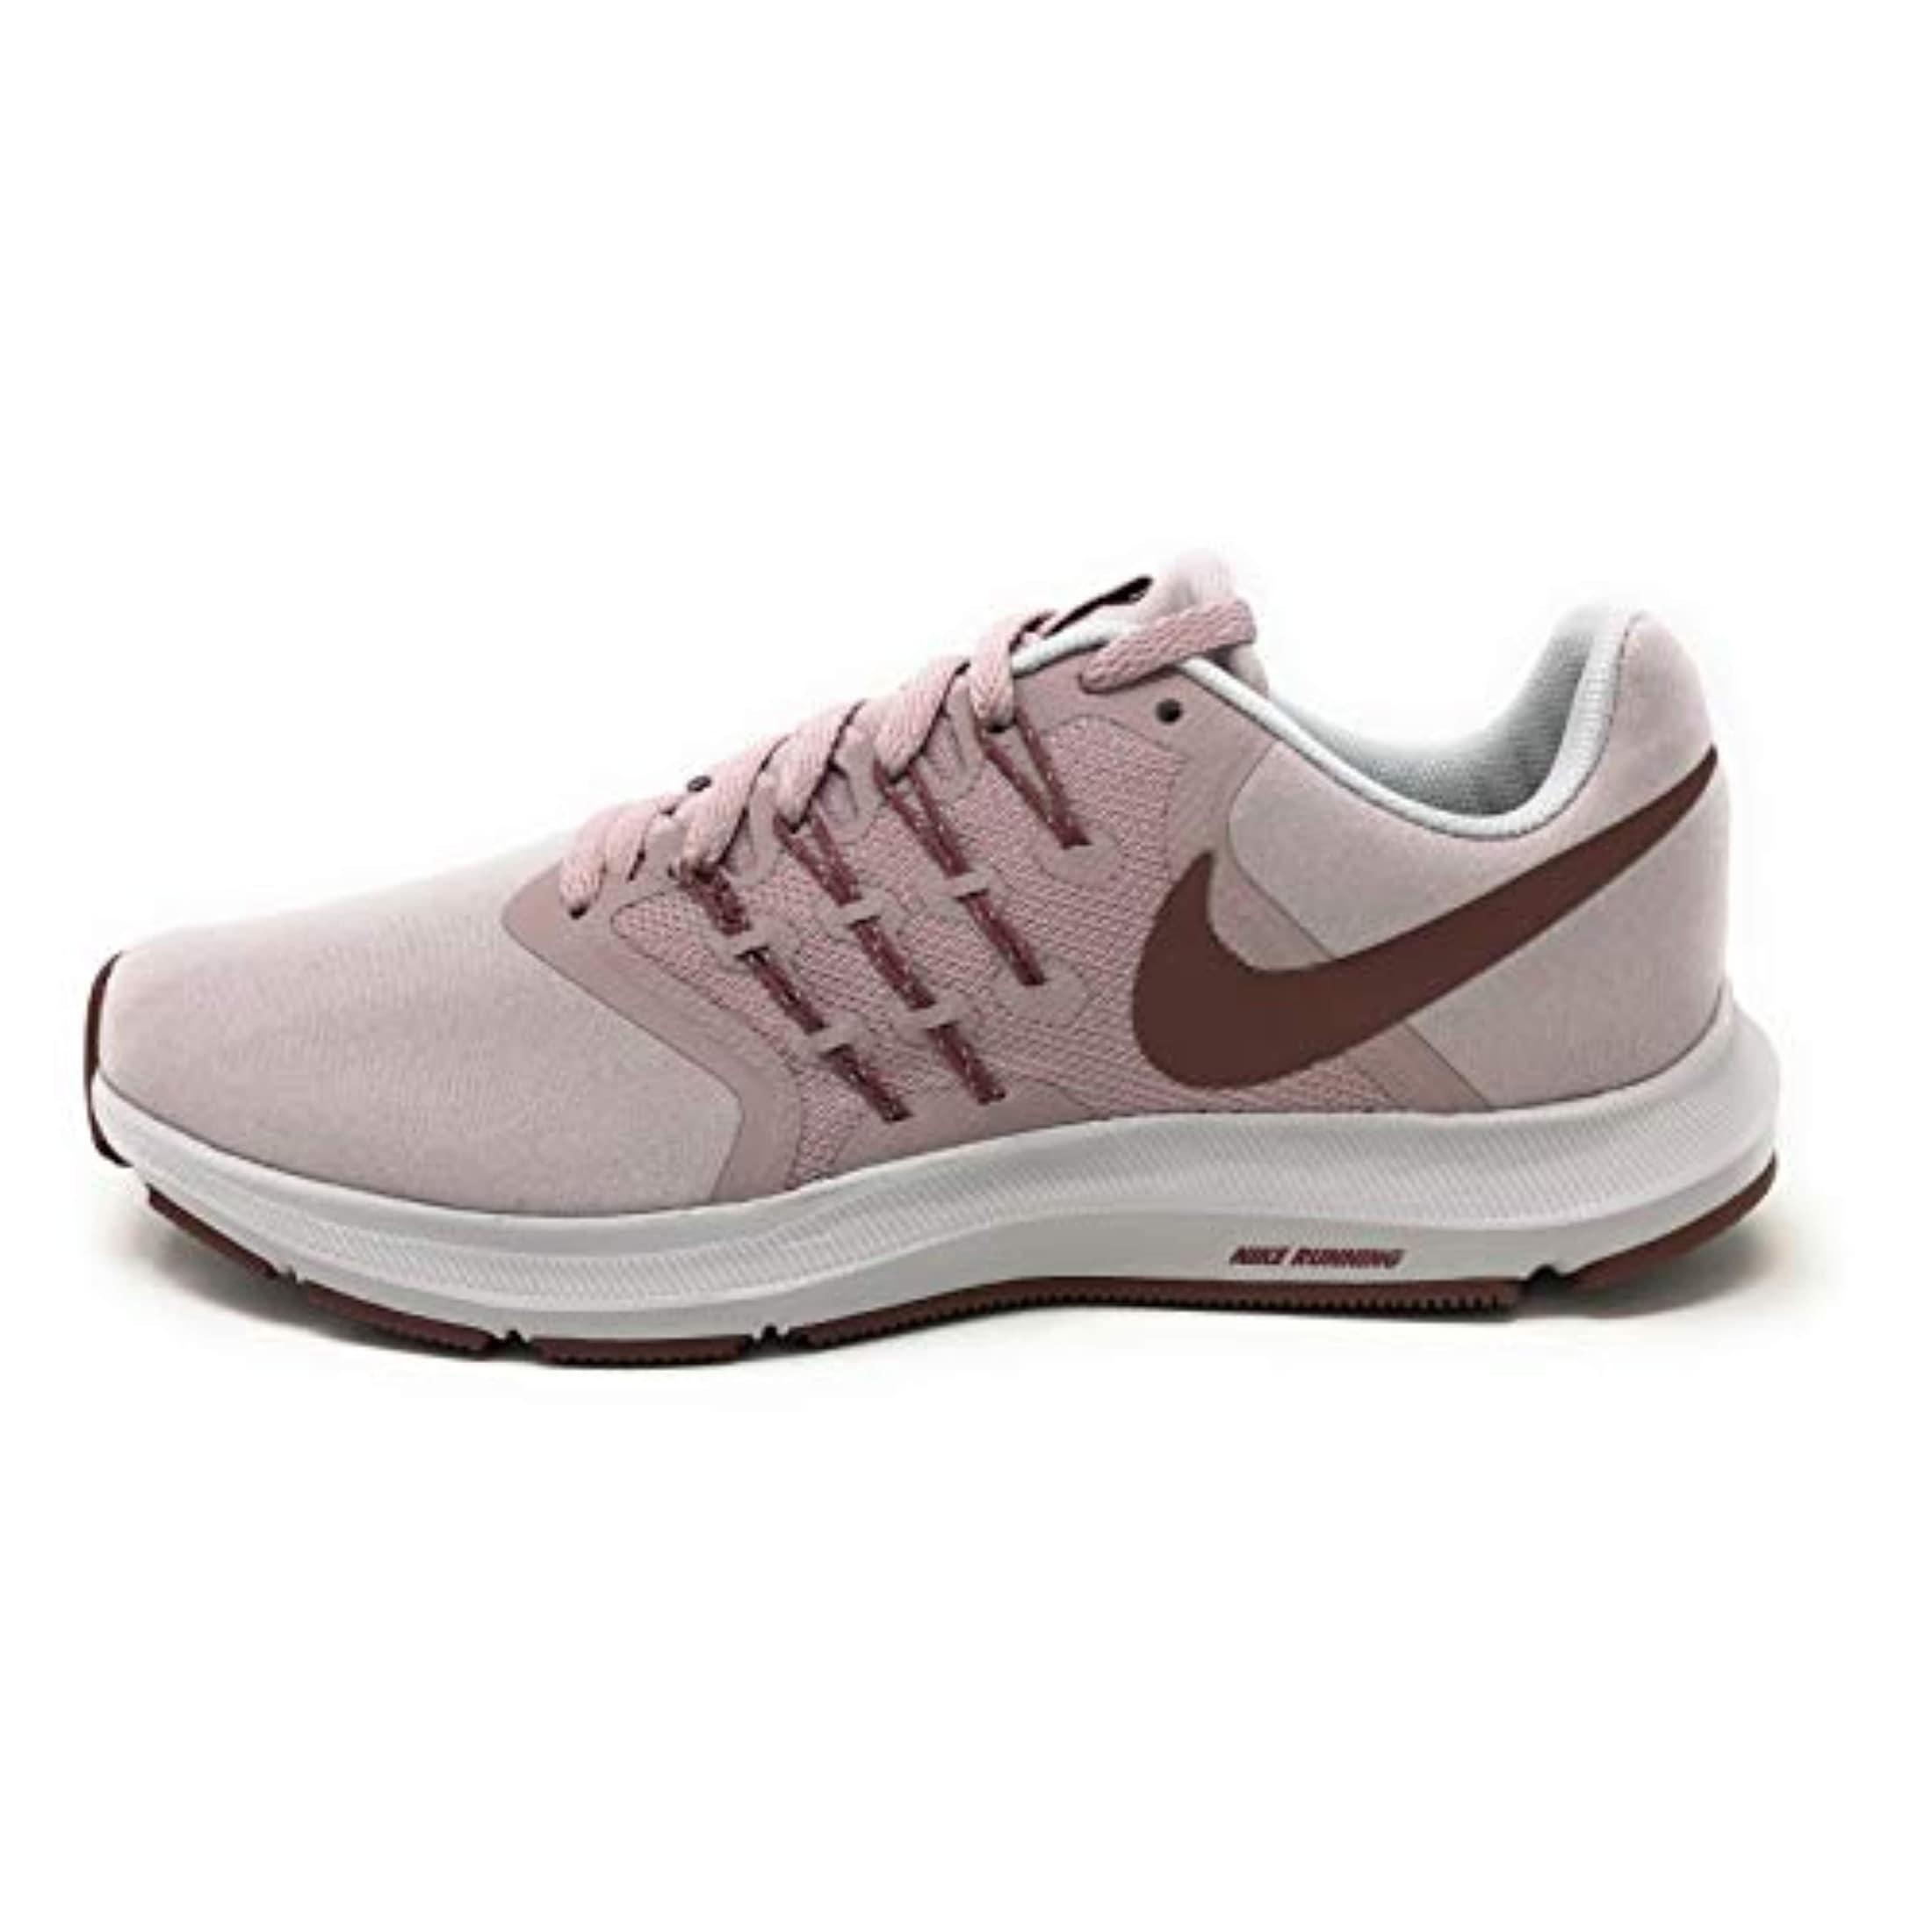 c647c275d Nike Women's Run Swift Running Shoe, Particle Rose/Smokey Mauve, Size 9.5 M  Us